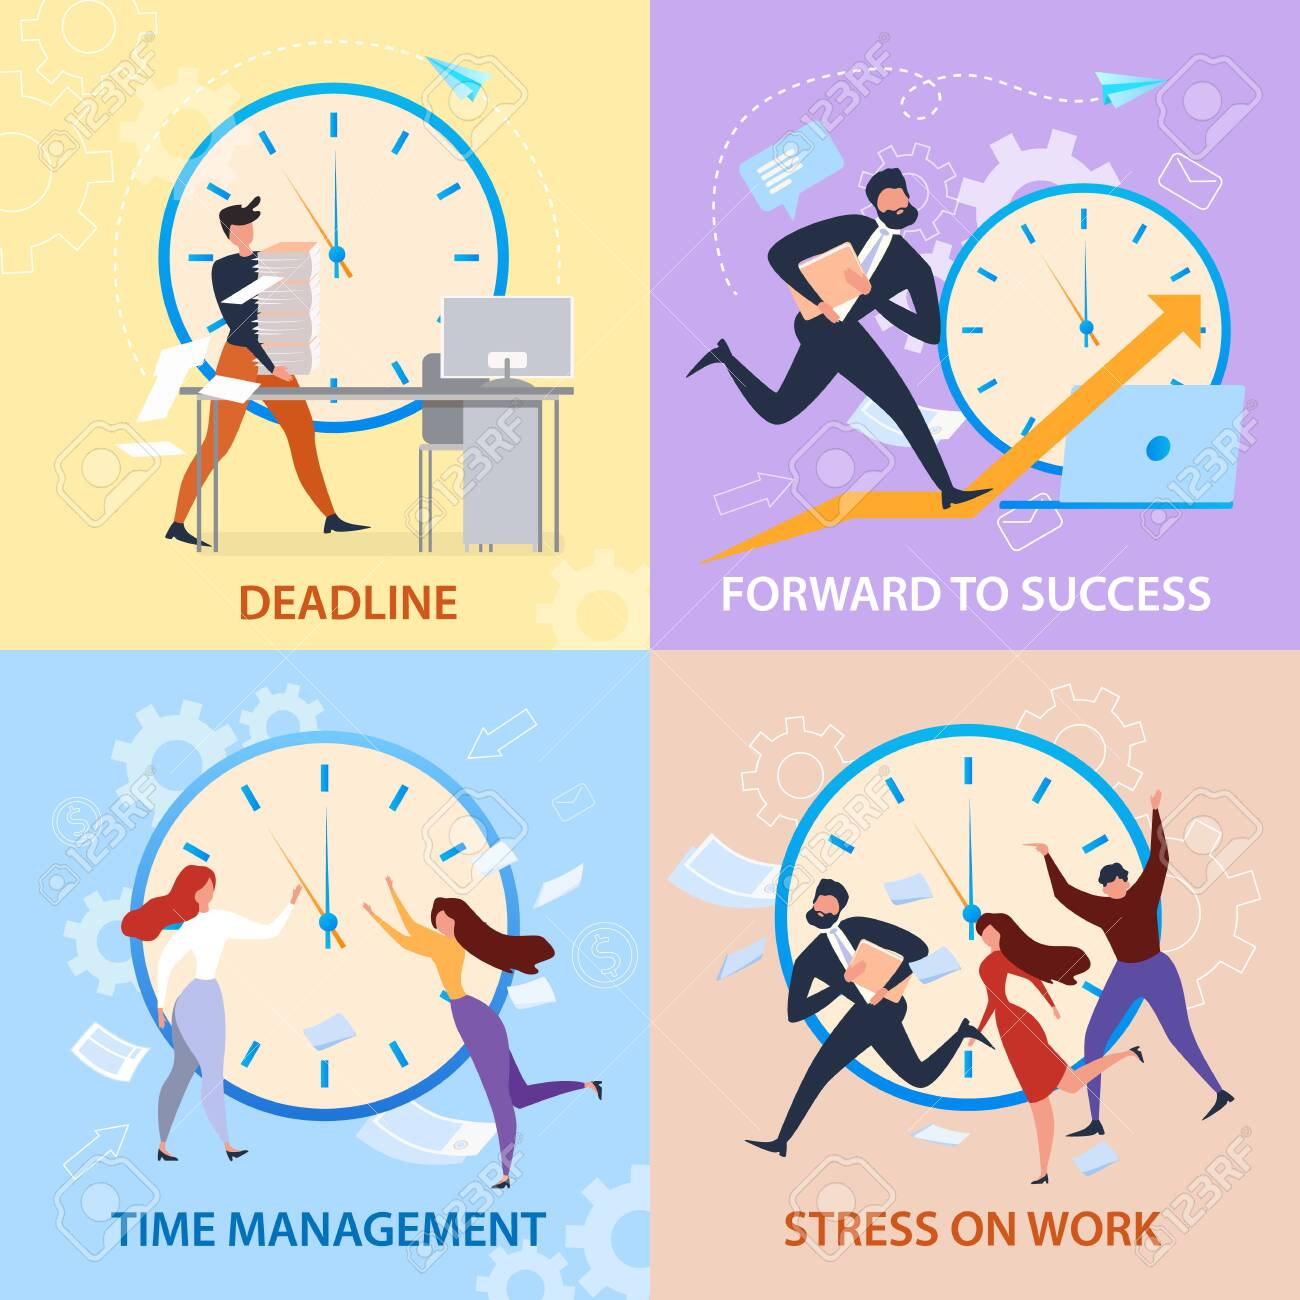 Forward to Sucess, Time Management, Stress on Work, Deadline Banner Set. Cartoon People Run. Work Problem, Schedule Organization. Winner Strategy, Career Promotion. Overtime Paperwork Vector - 123529121